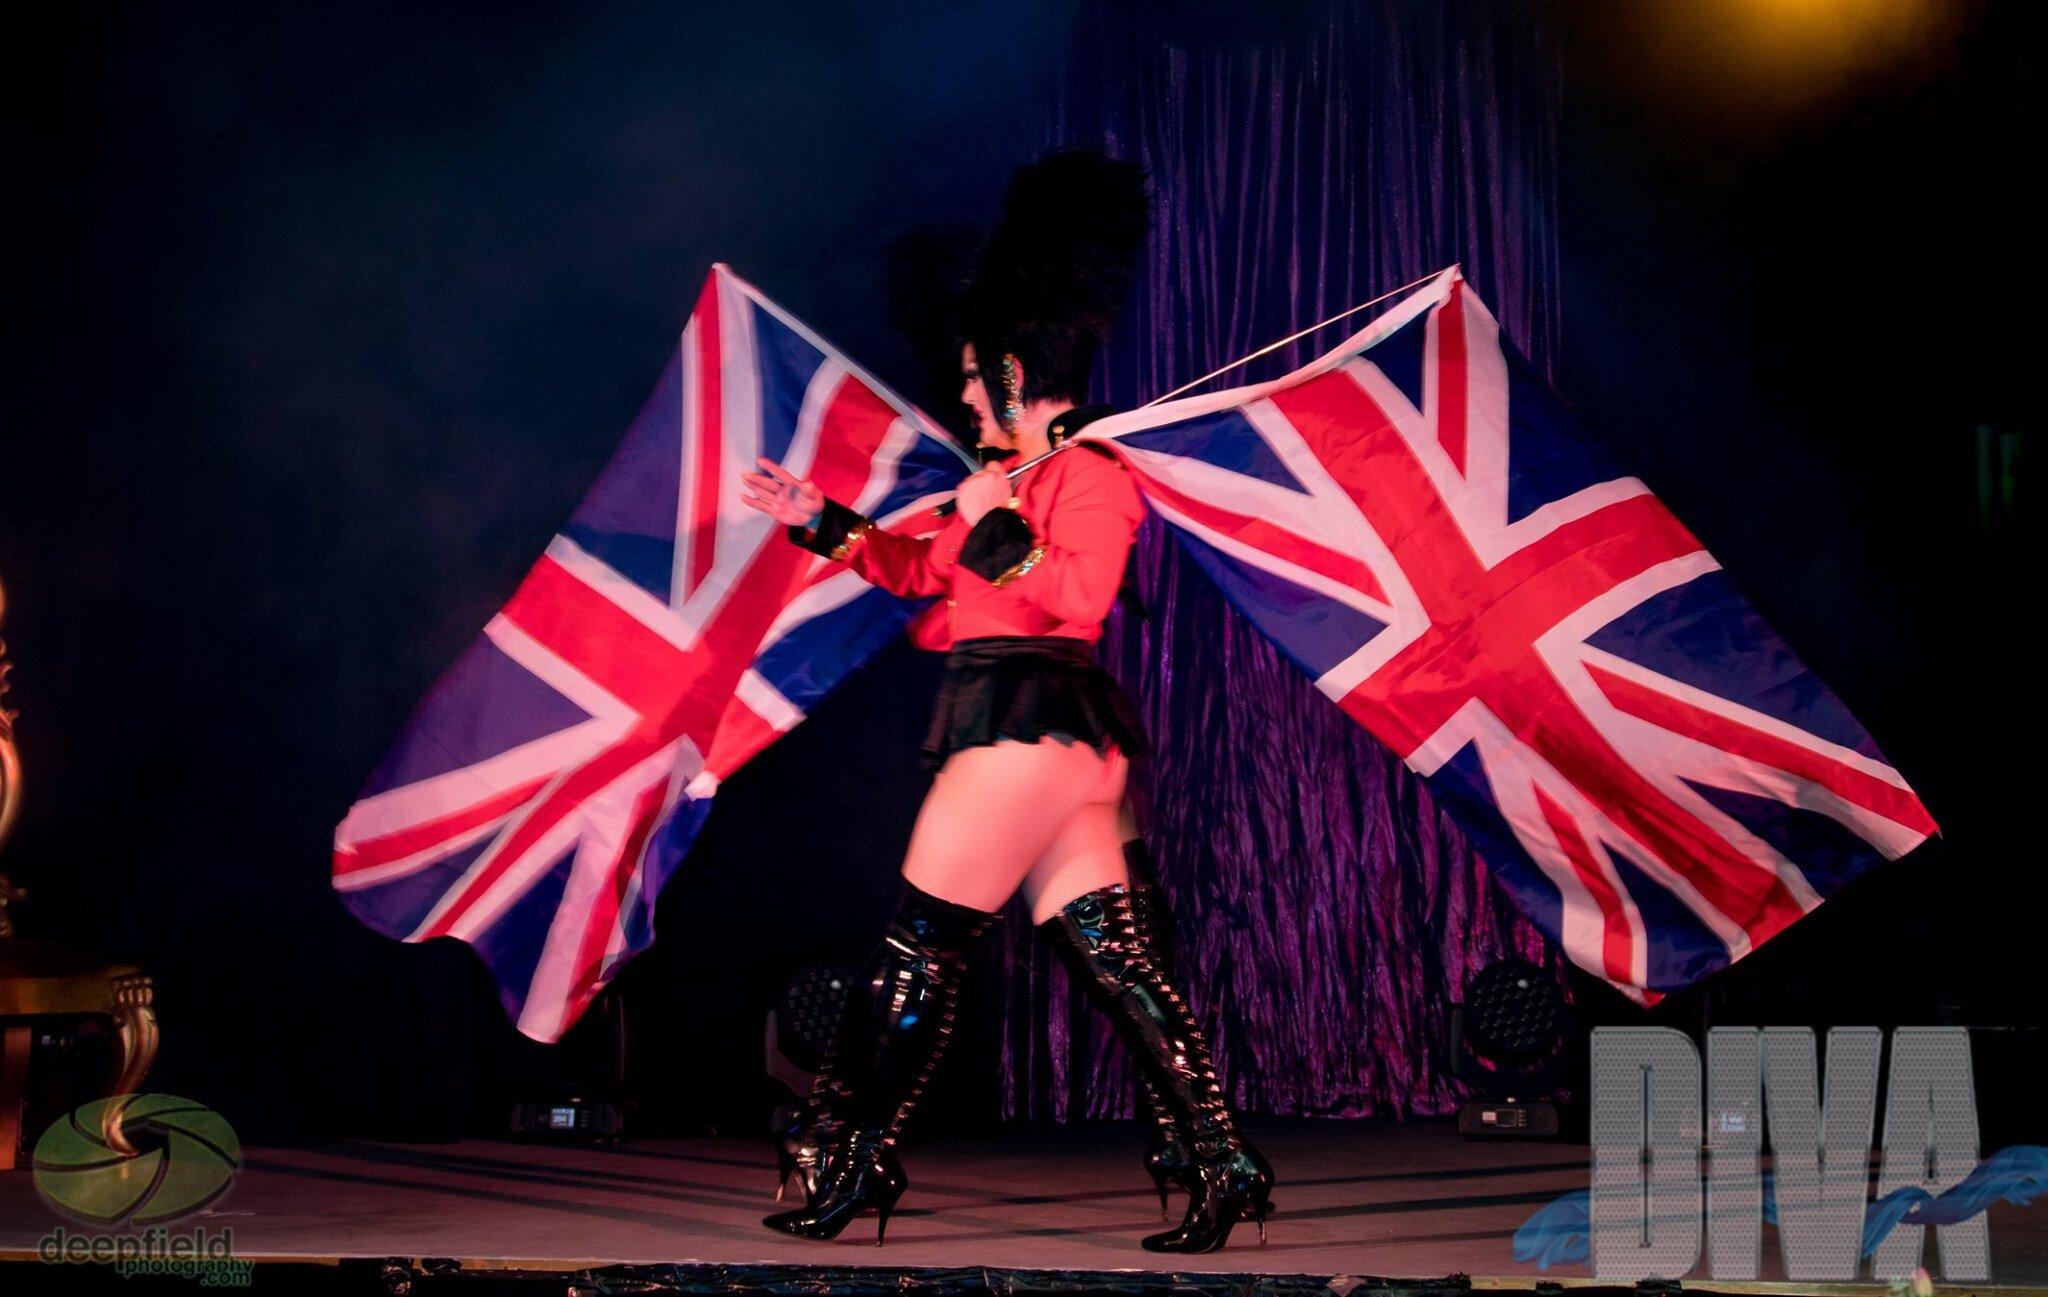 brits-n-pieces-hannah-conda-carmen-geddit-sia-tequila-diva-awards-sydney-drag-queen-royalty-best-hire-drag-race-australia-2.jpg